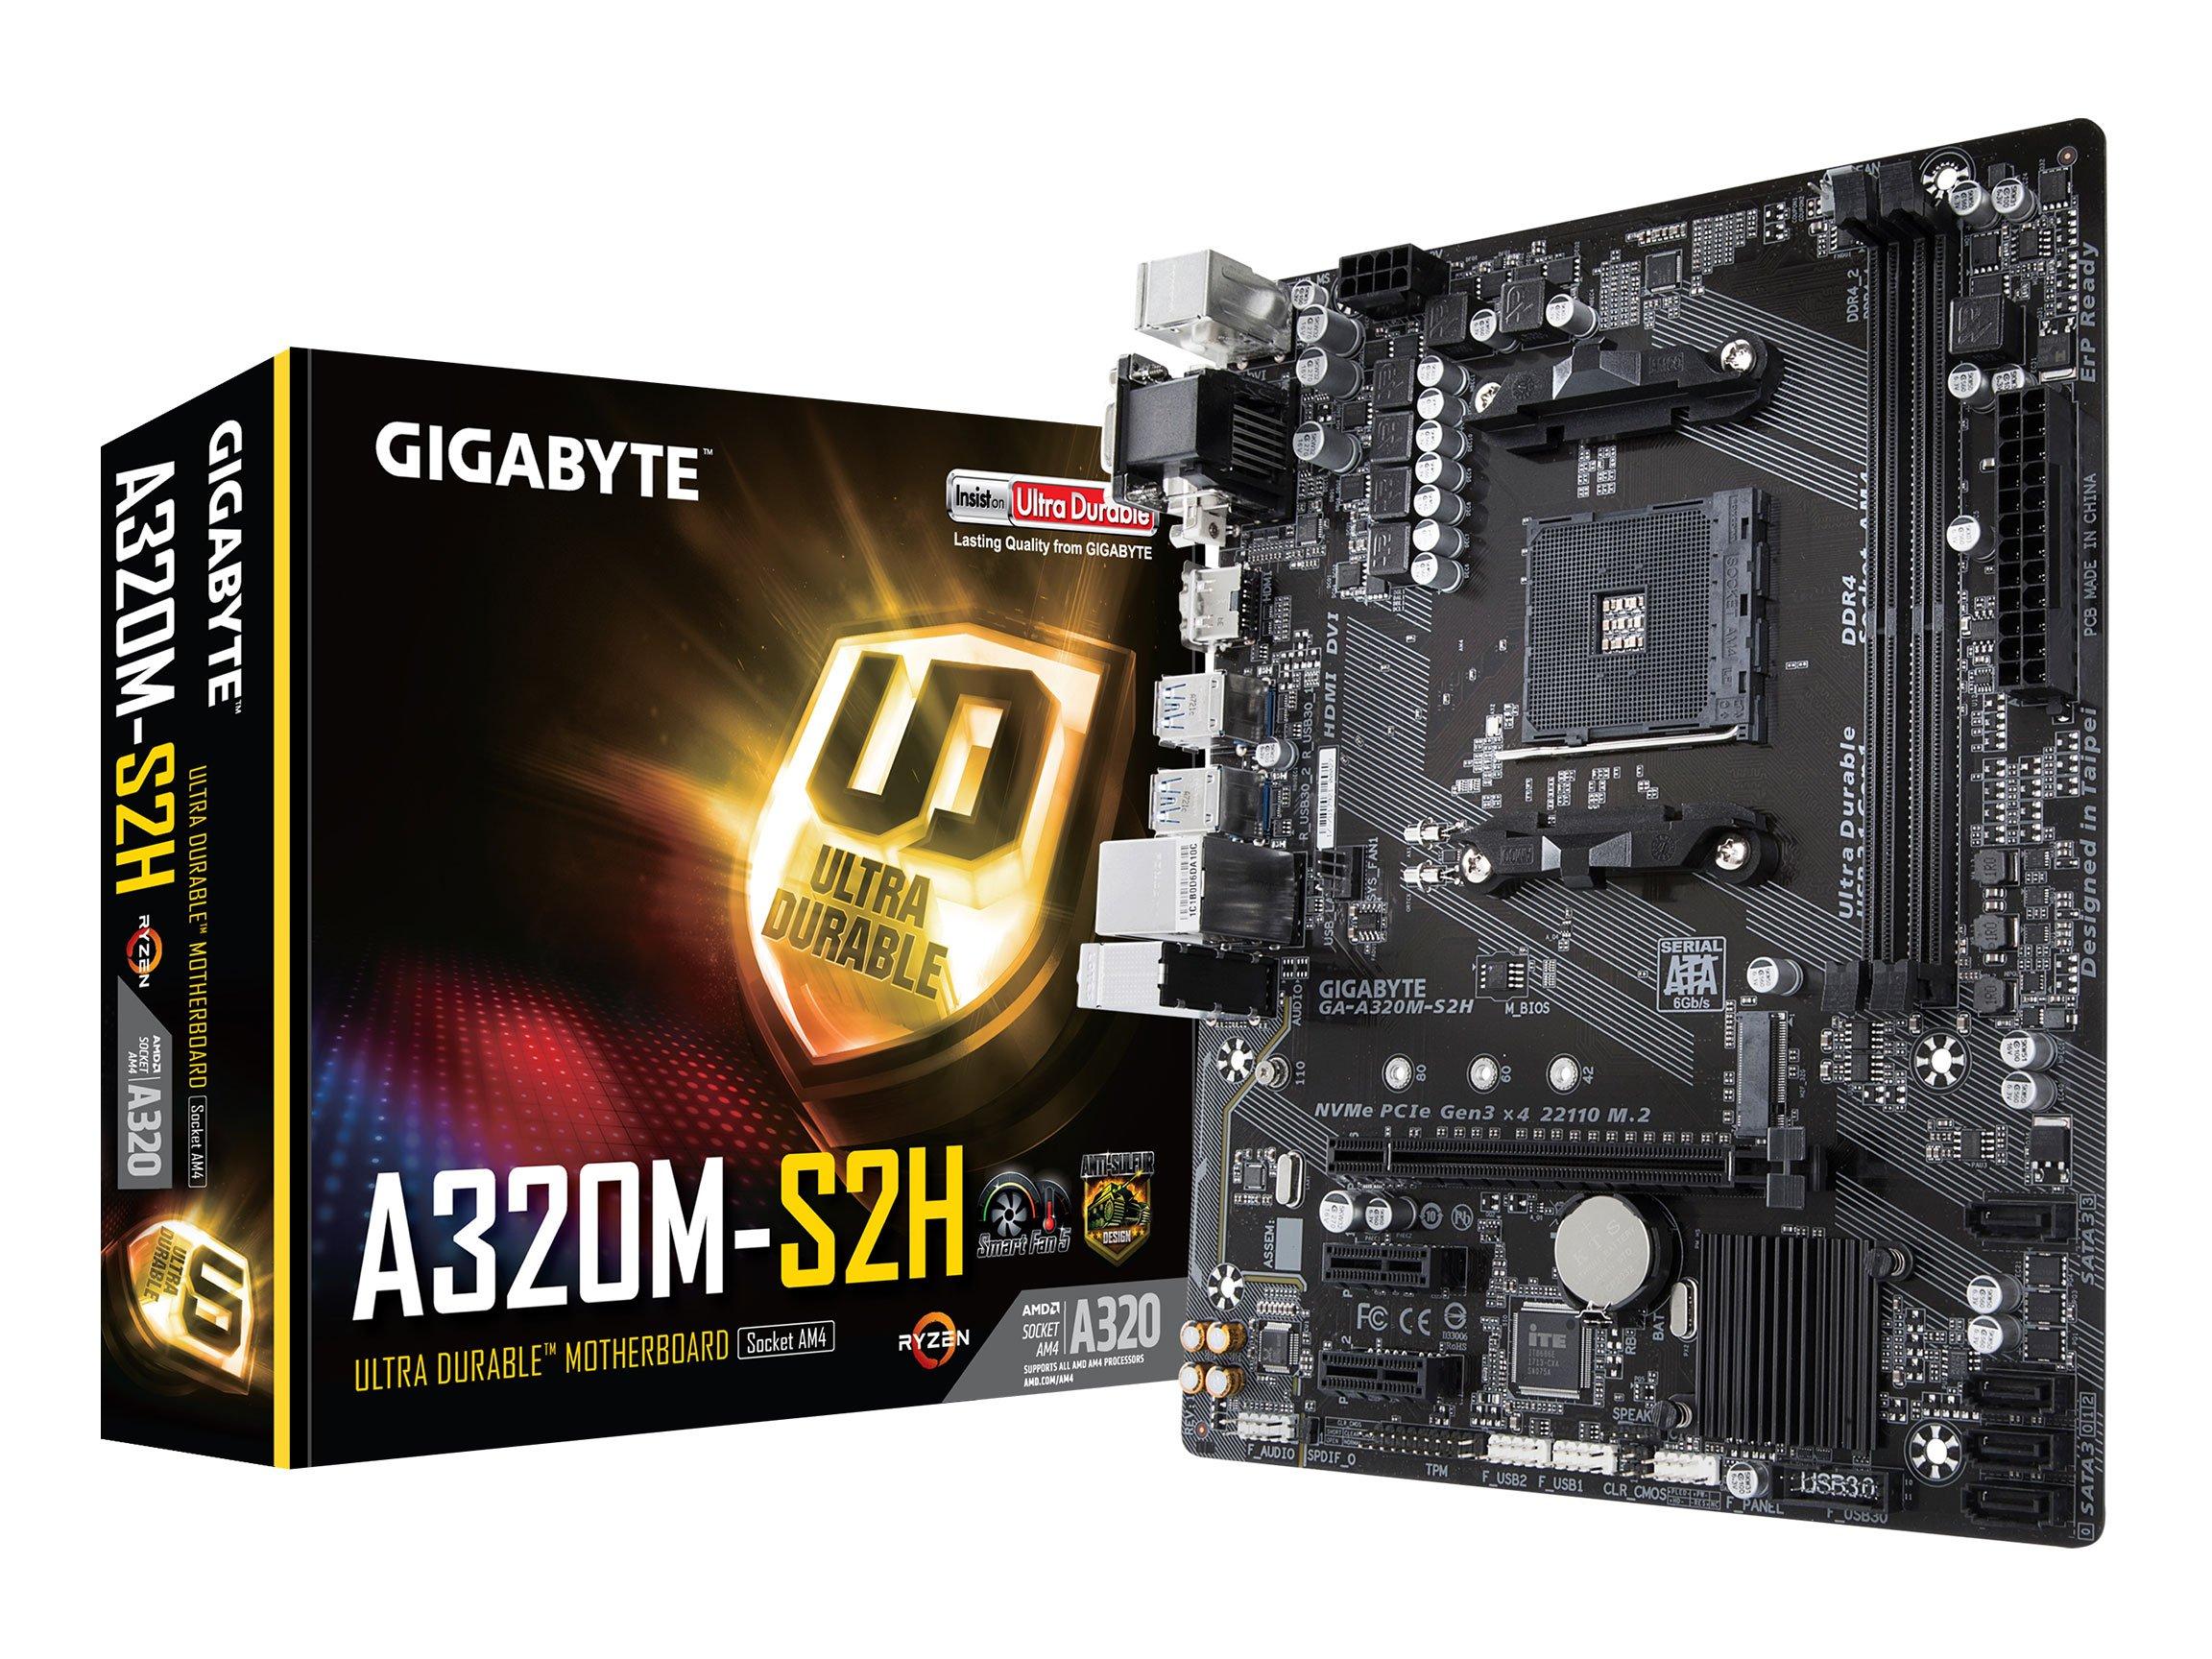 Gigabyte Ga-a320m-s2h (amd Ryzen Am4 / Microatx / 2xddr4/...